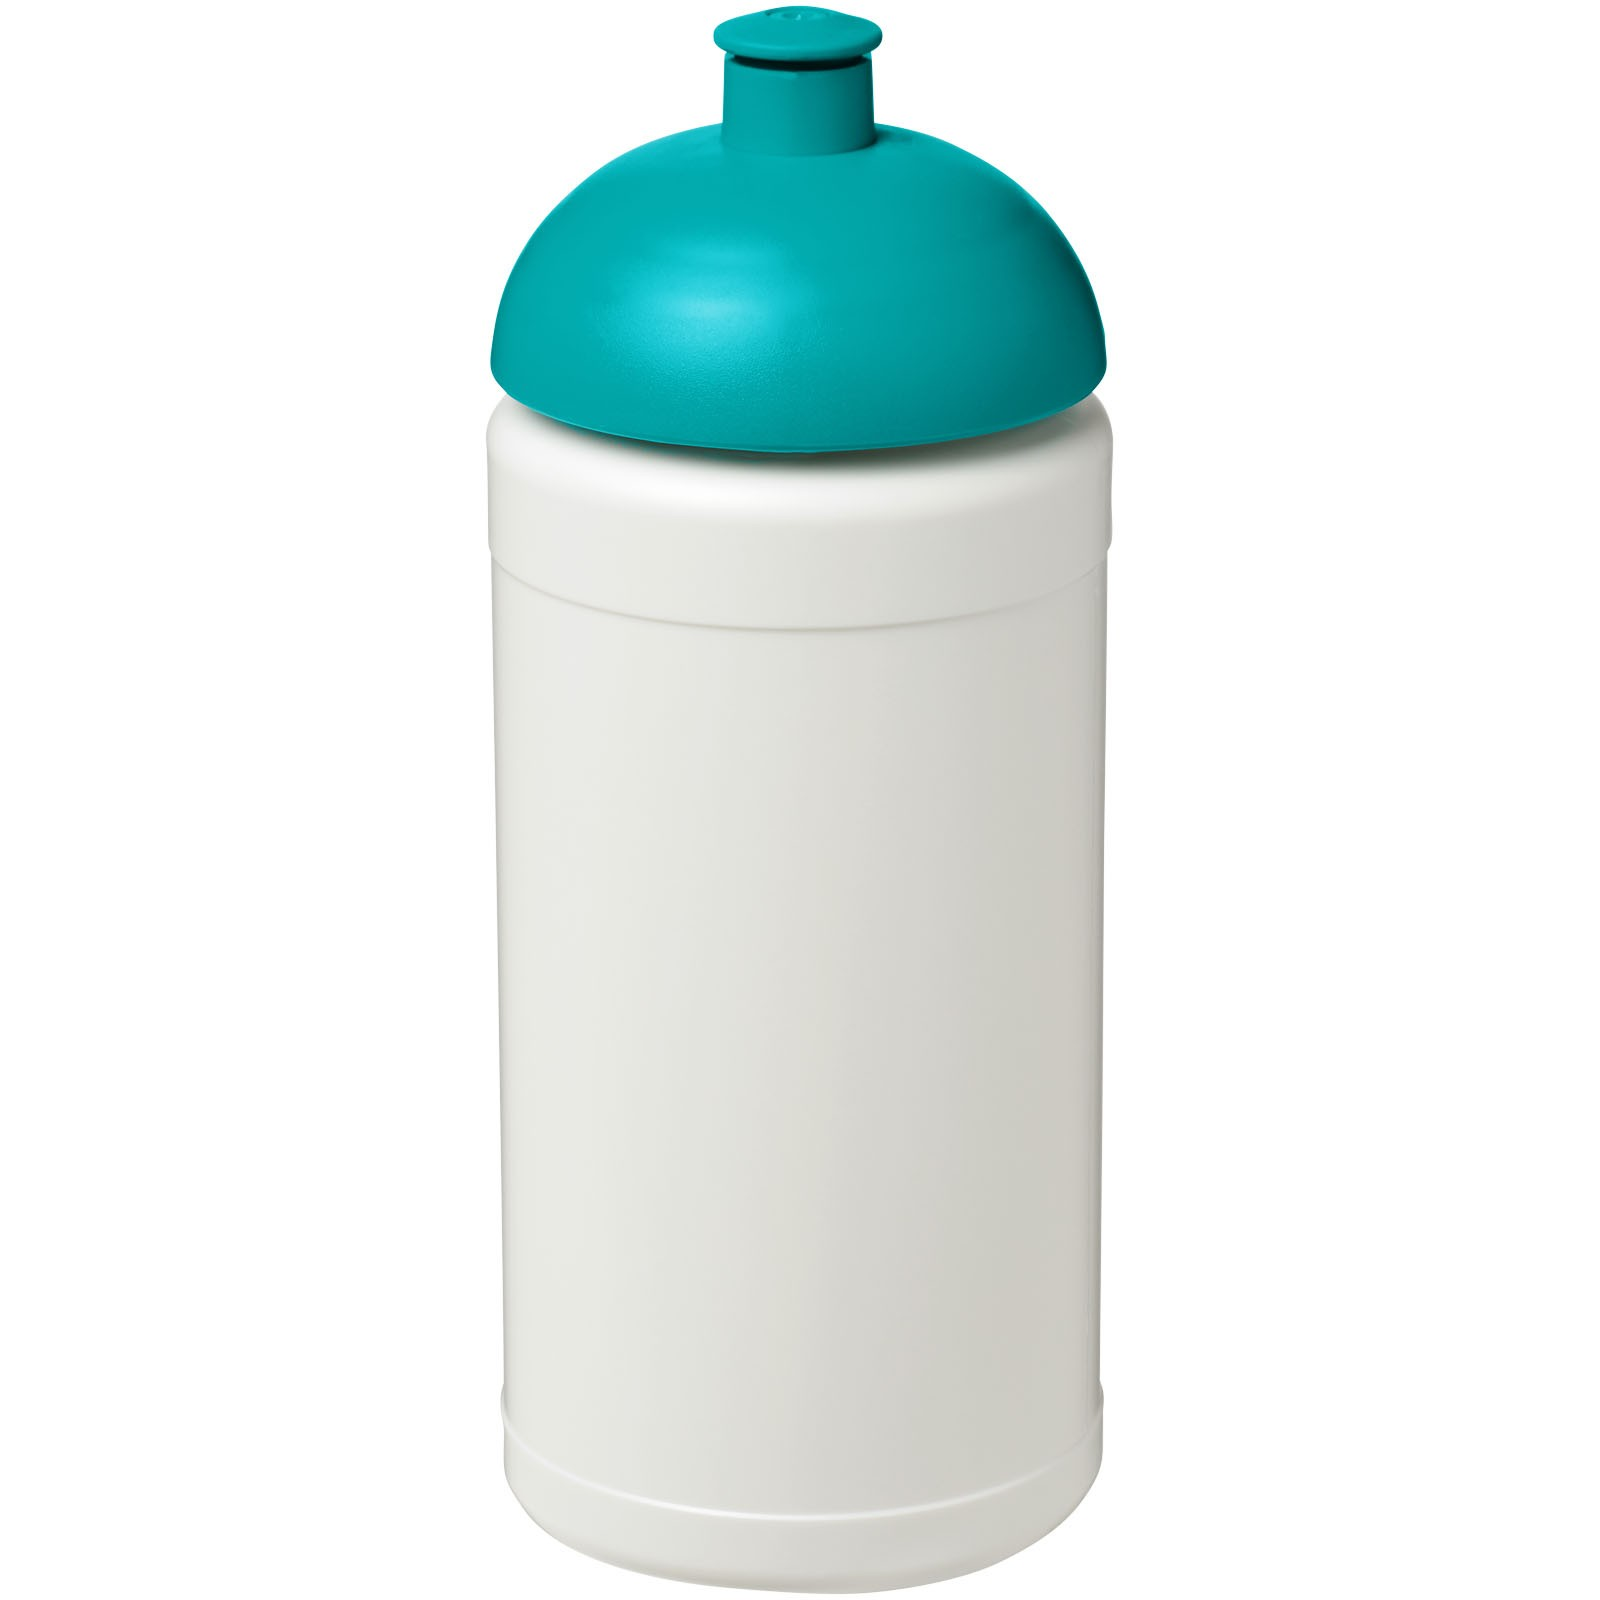 Baseline® Plus 500 ml dome lid sport bottle - White / Aqua